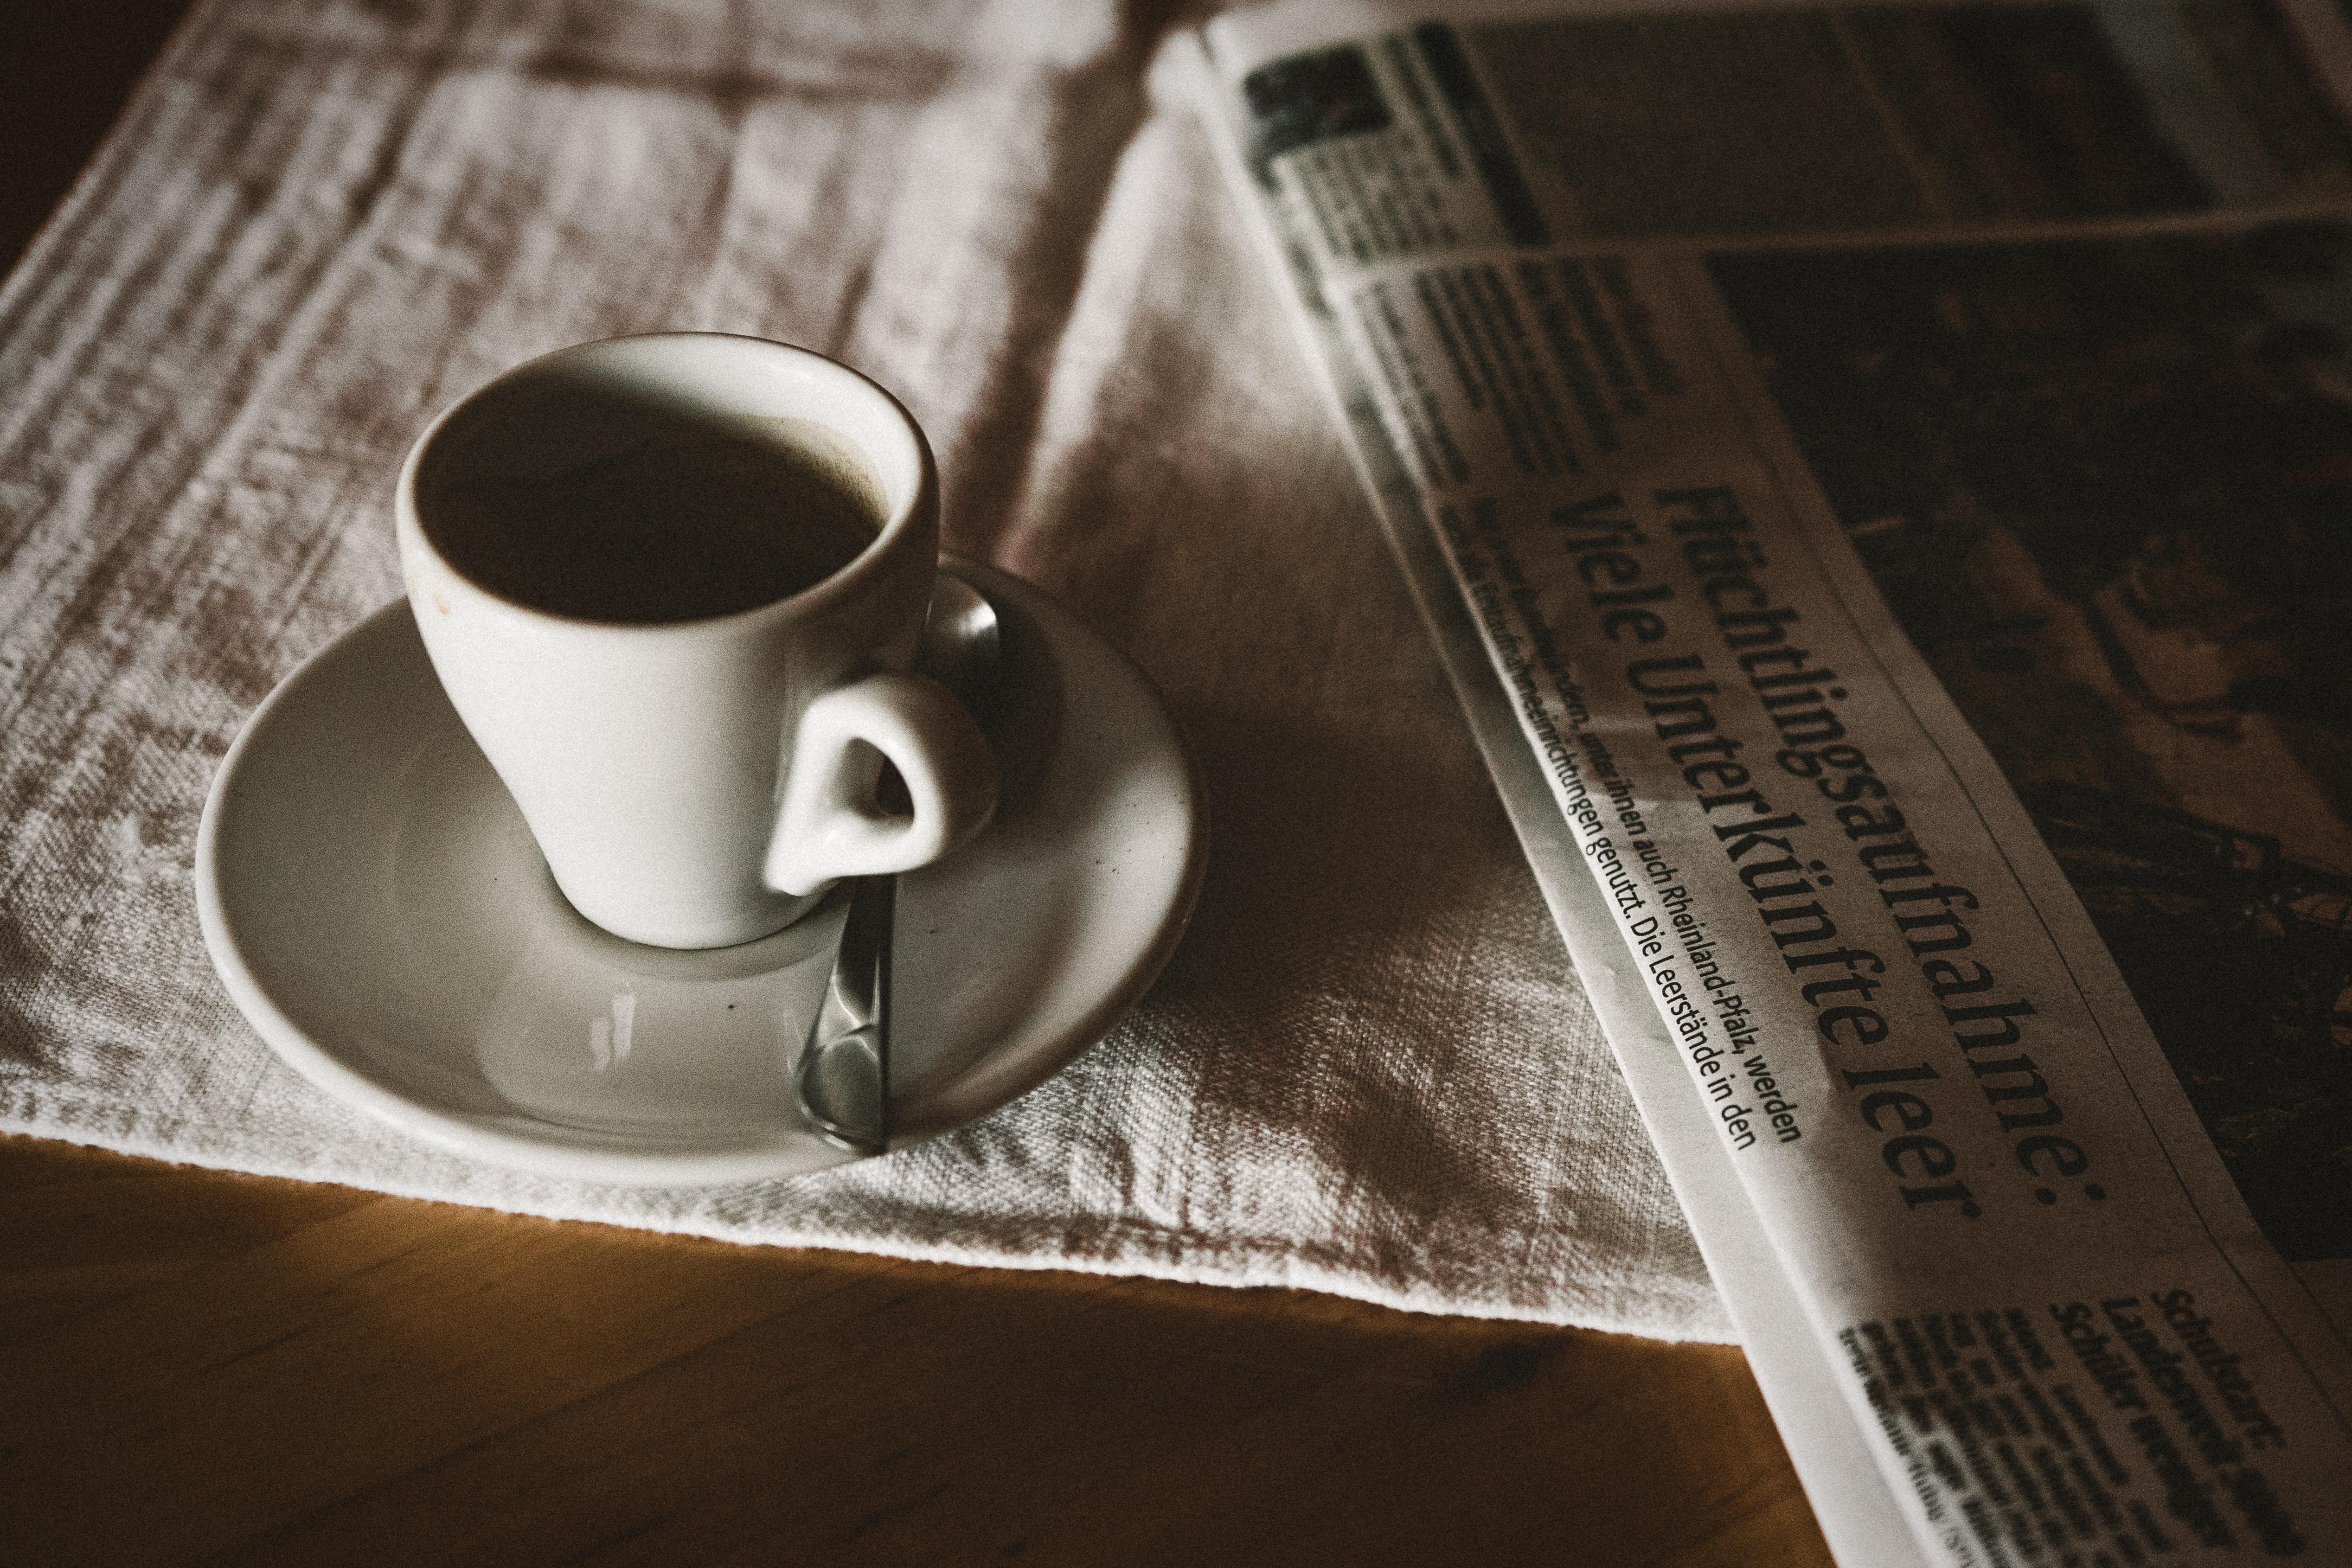 teacup on saucer near newspaper